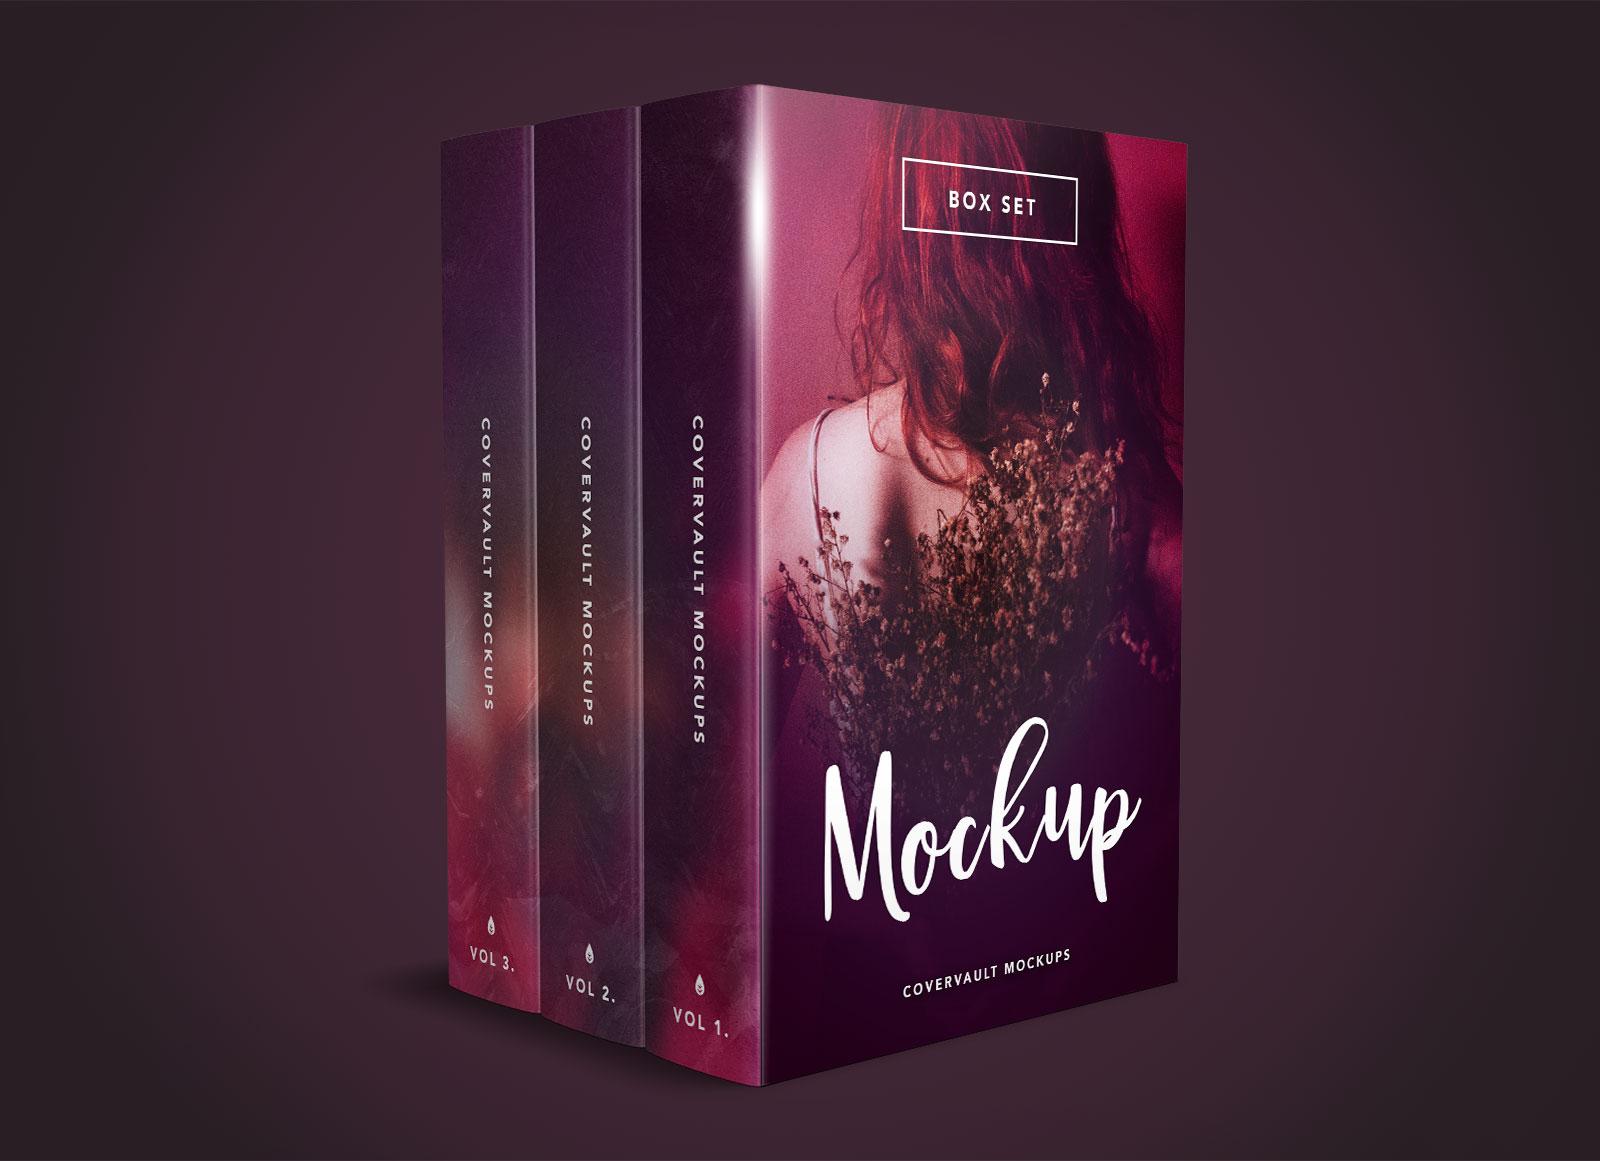 Free-3-Books-Set-PSD-Mockup-Template